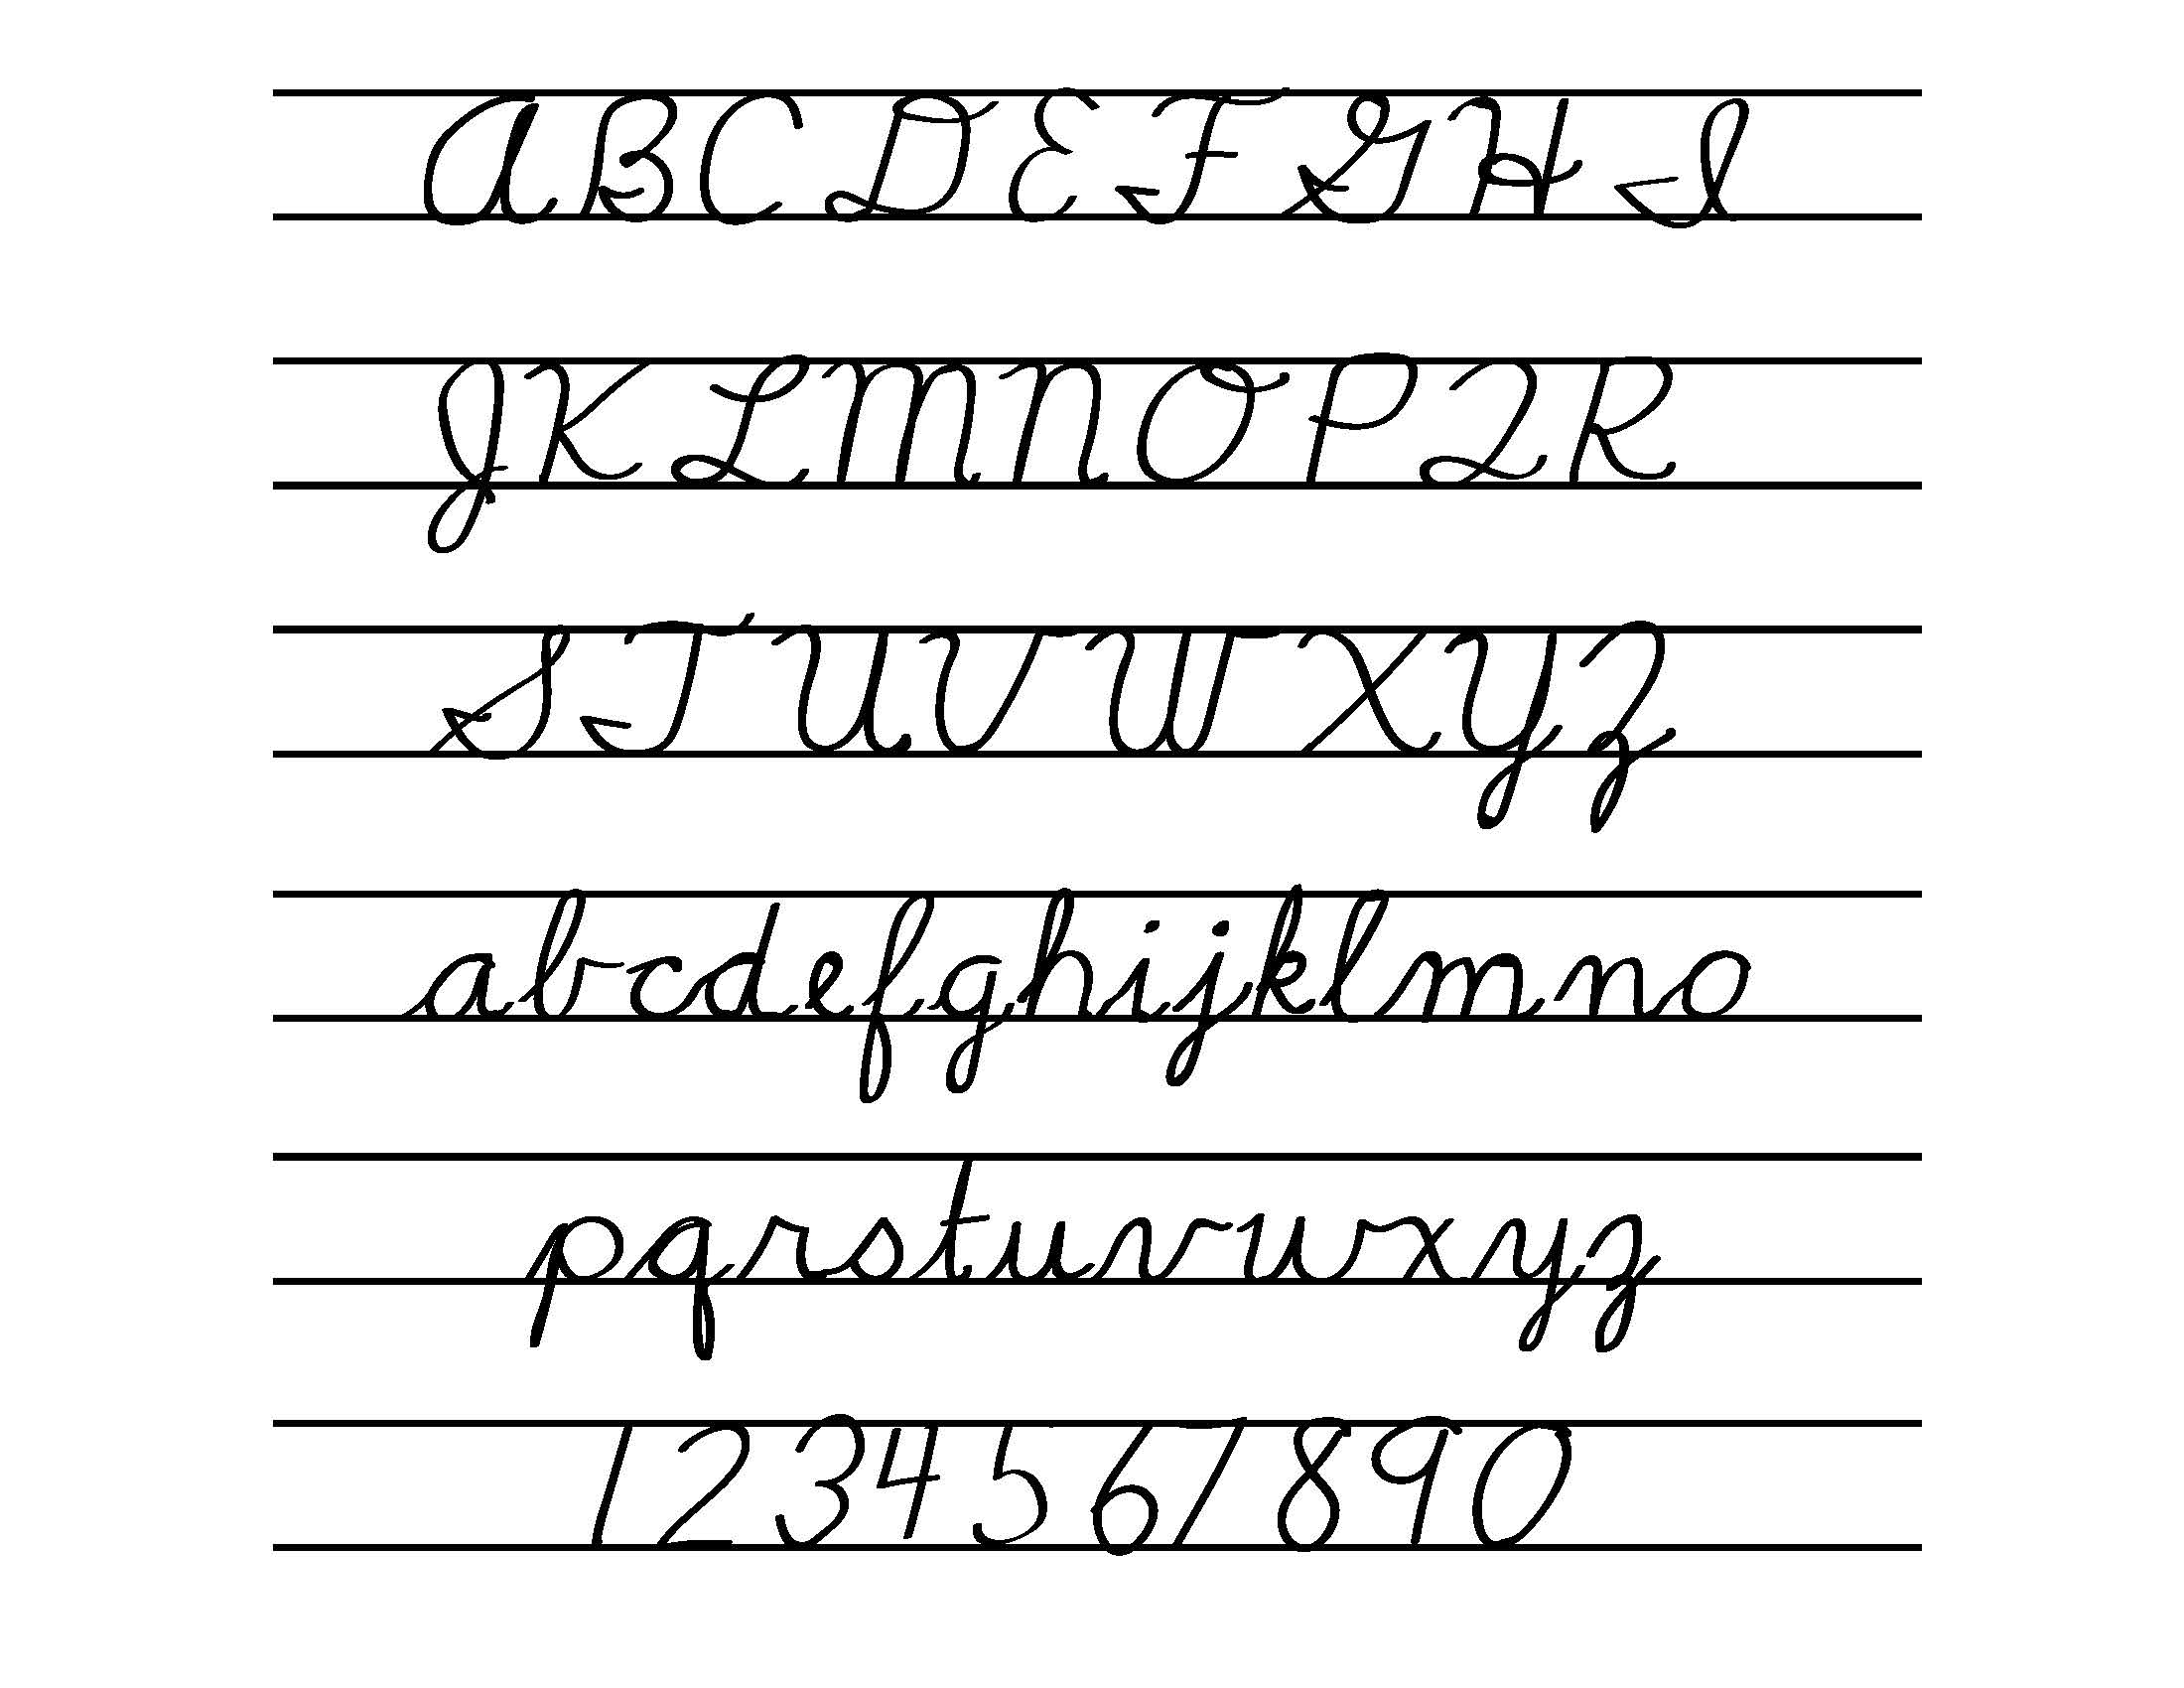 The Art Of The Handwritten Letterform